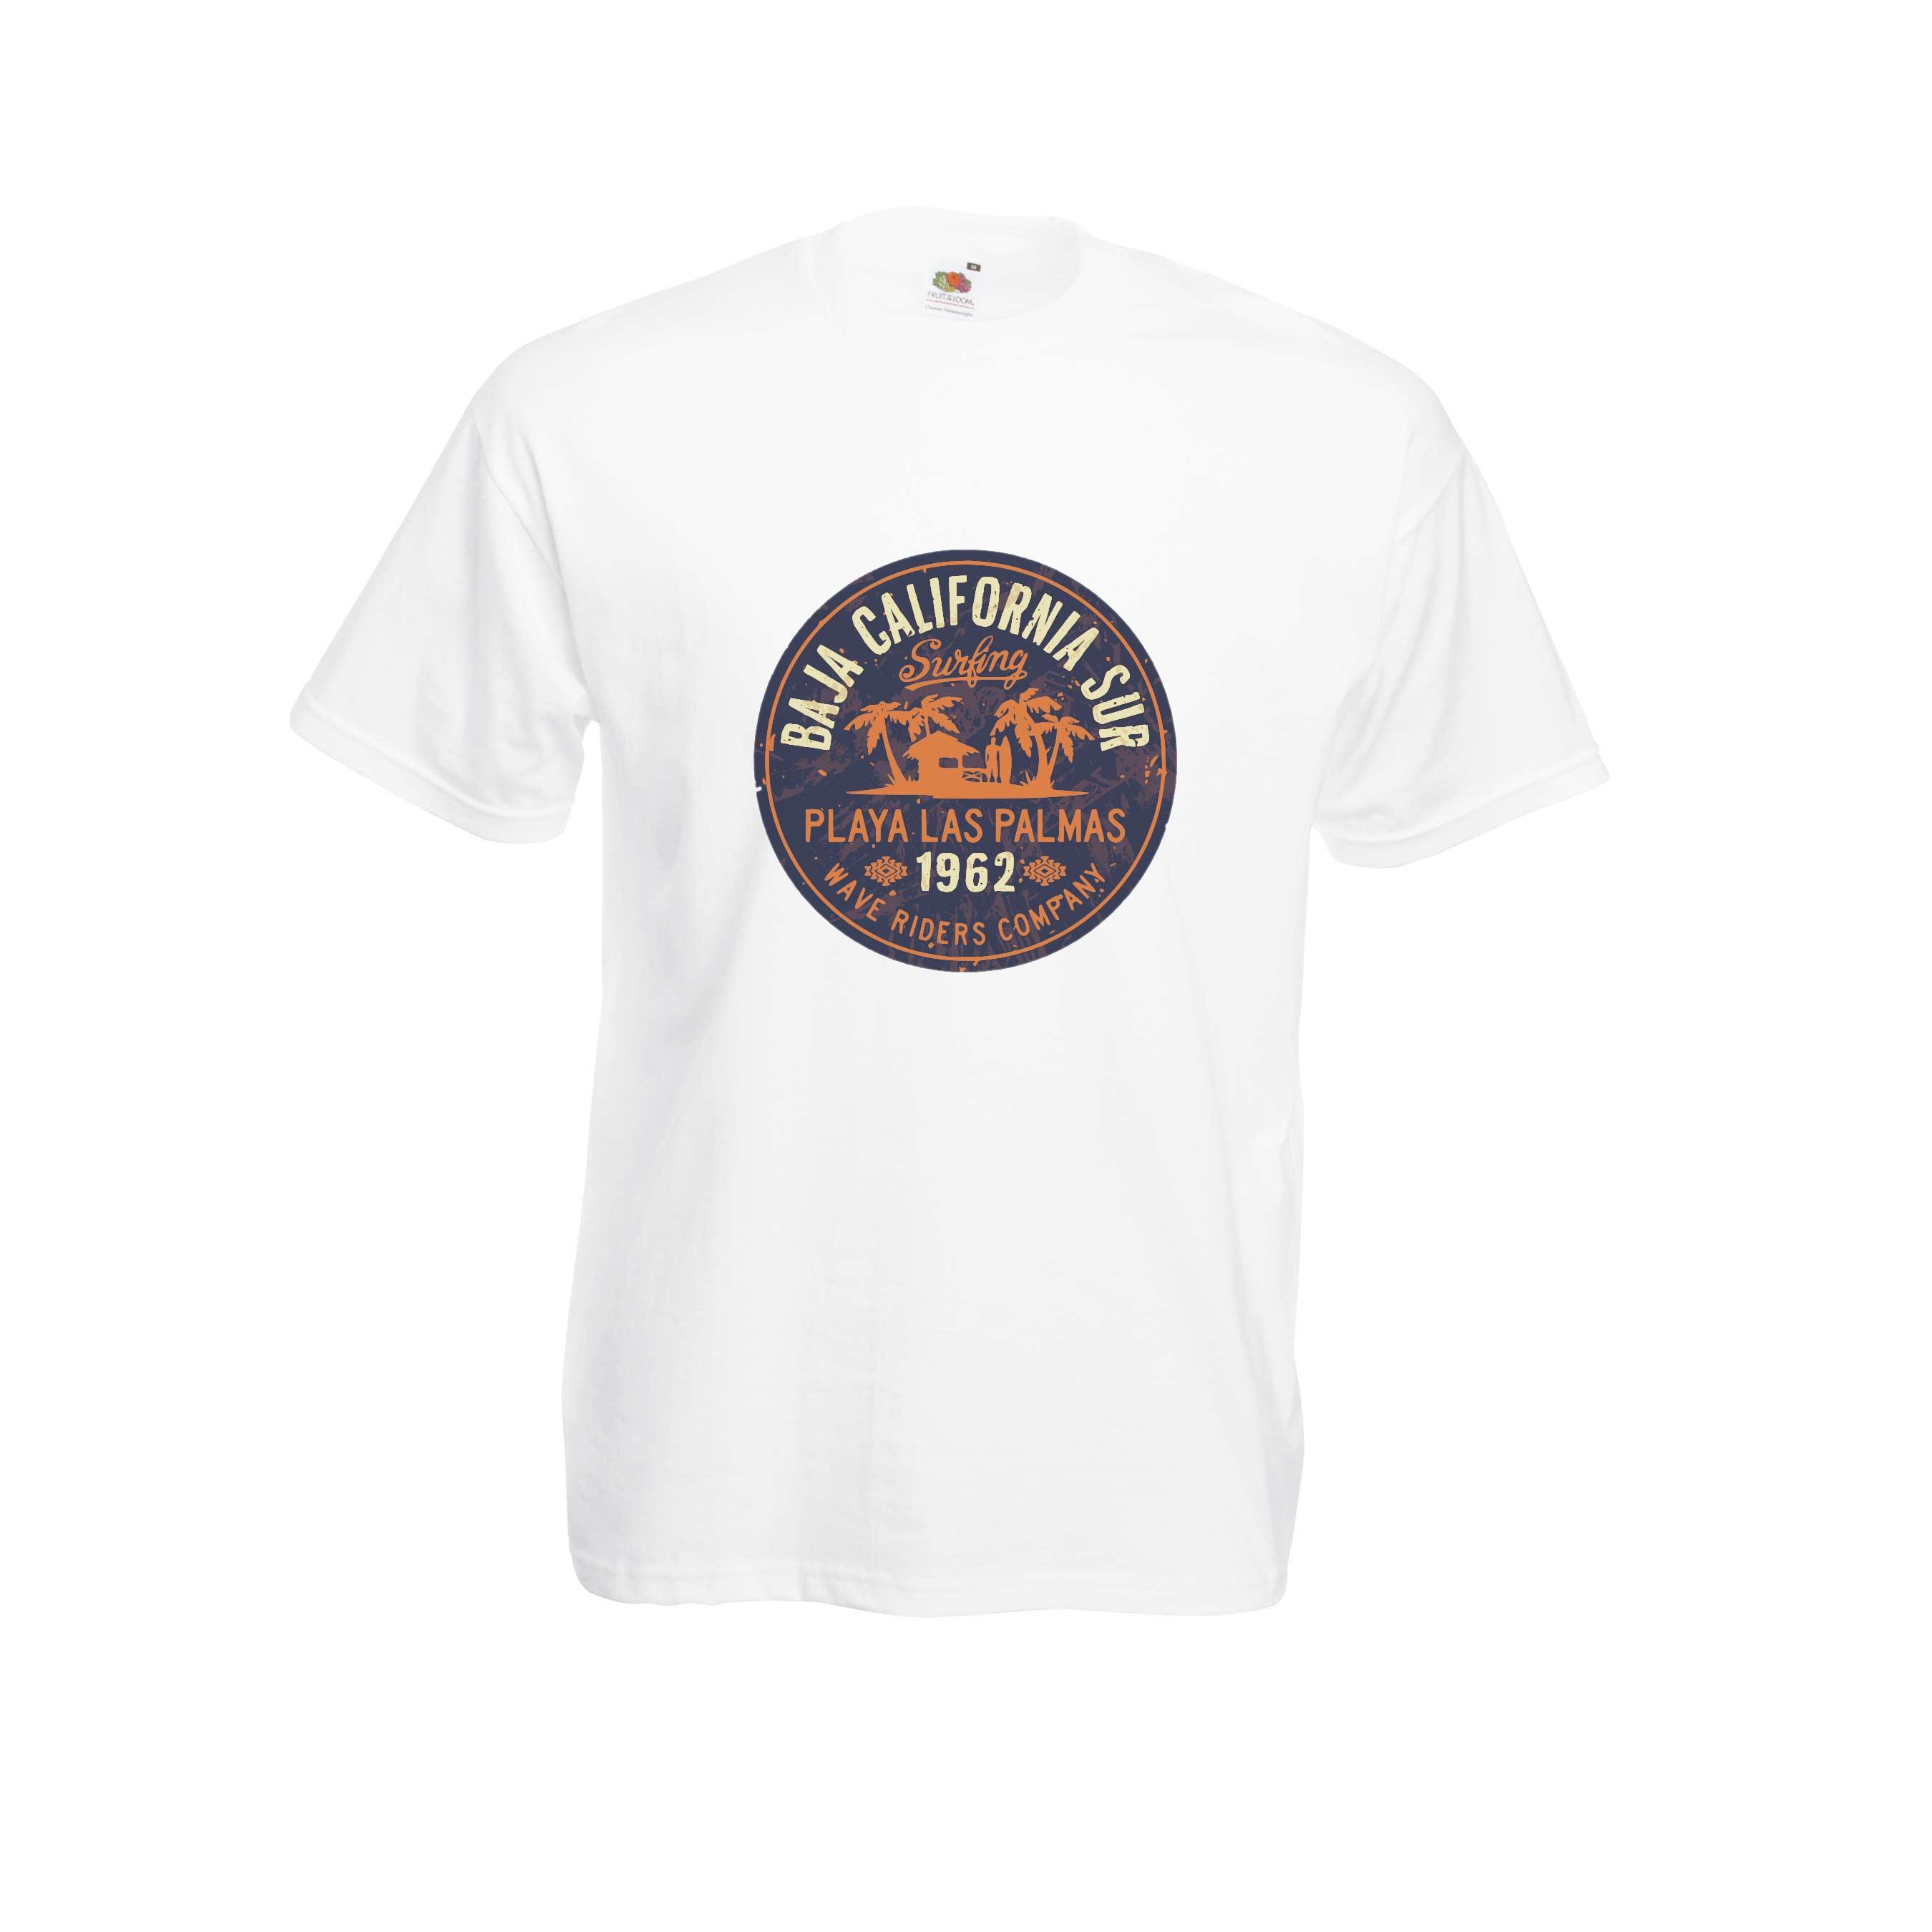 Baja Sur design for t-shirt, hoodie & sweatshirt